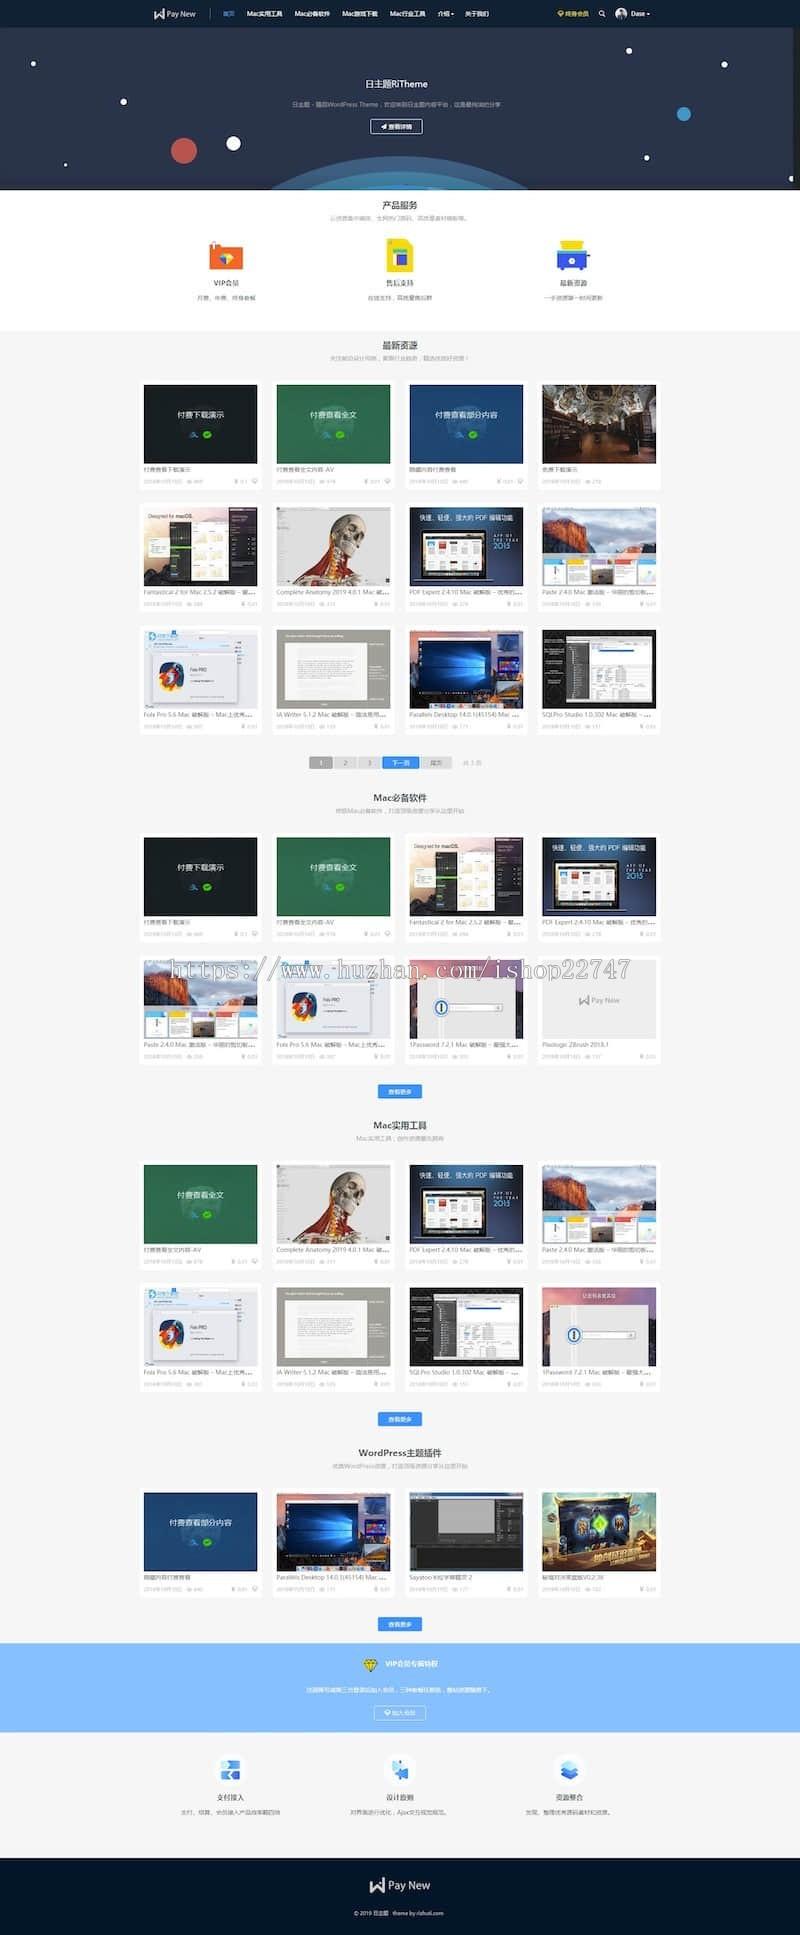 WordPress下载类主题Rizhuti日主题v3.3破解源码 日主题v3.3 第1张